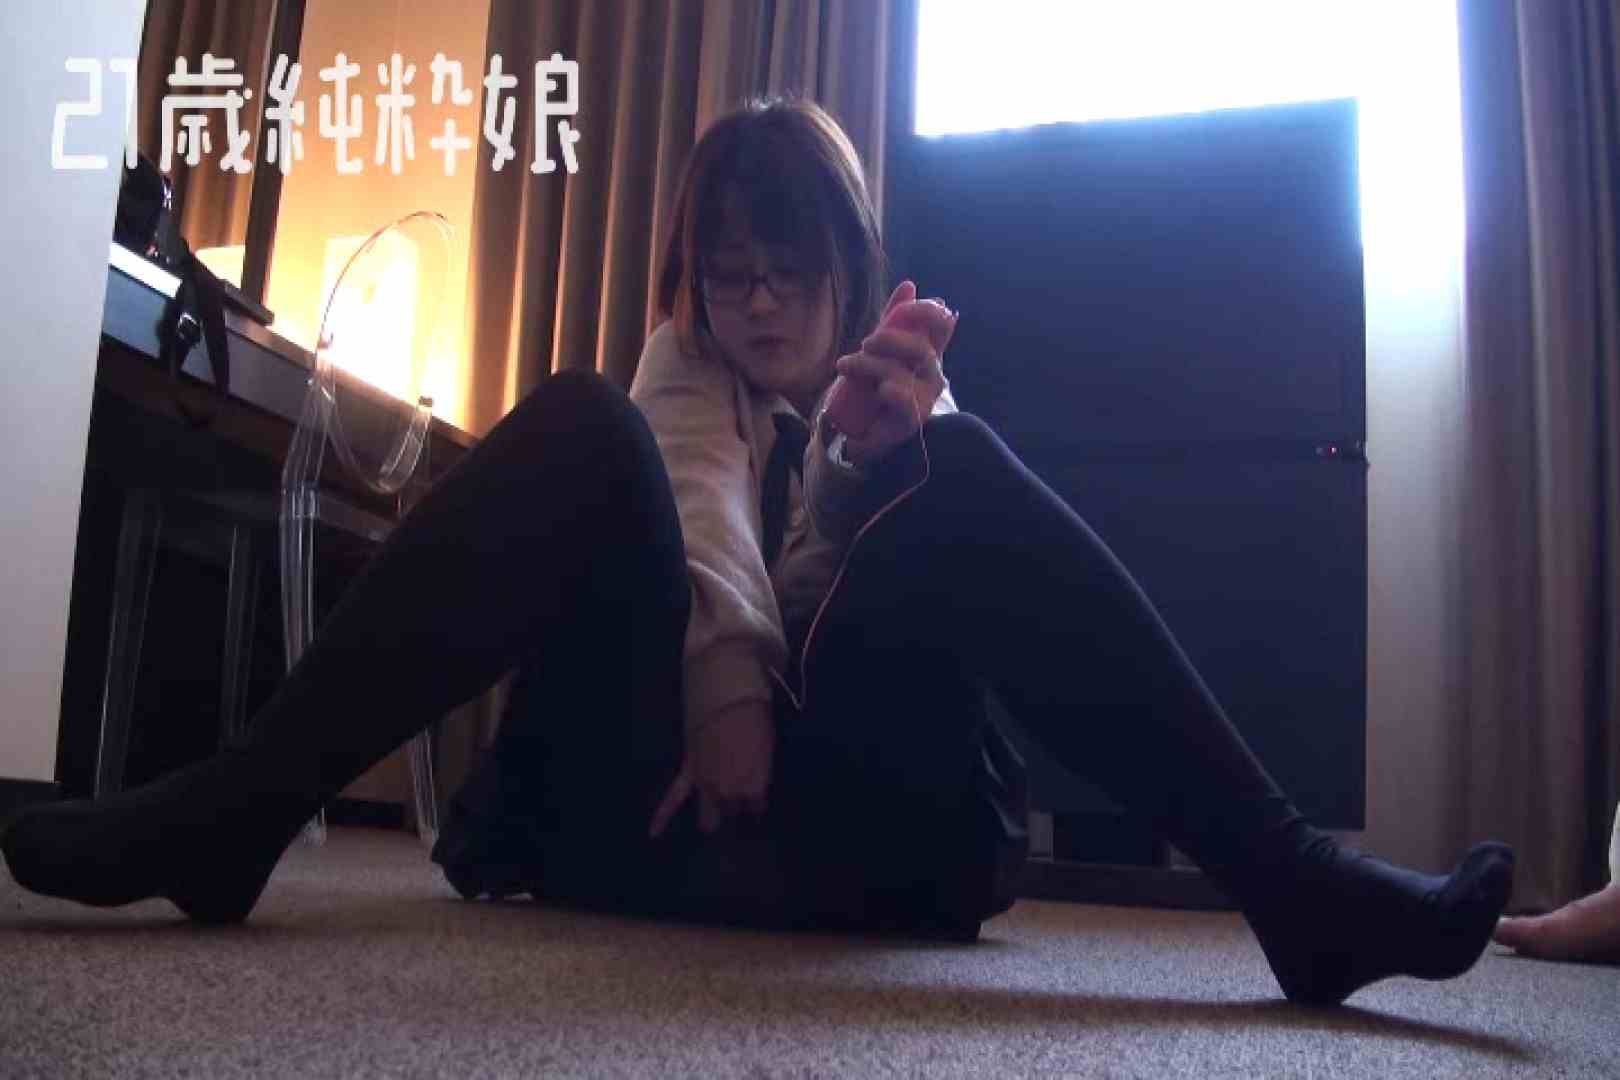 Gカップ21歳純粋嬢第2弾Vol.3 性欲 盗撮動画紹介 71pic 2